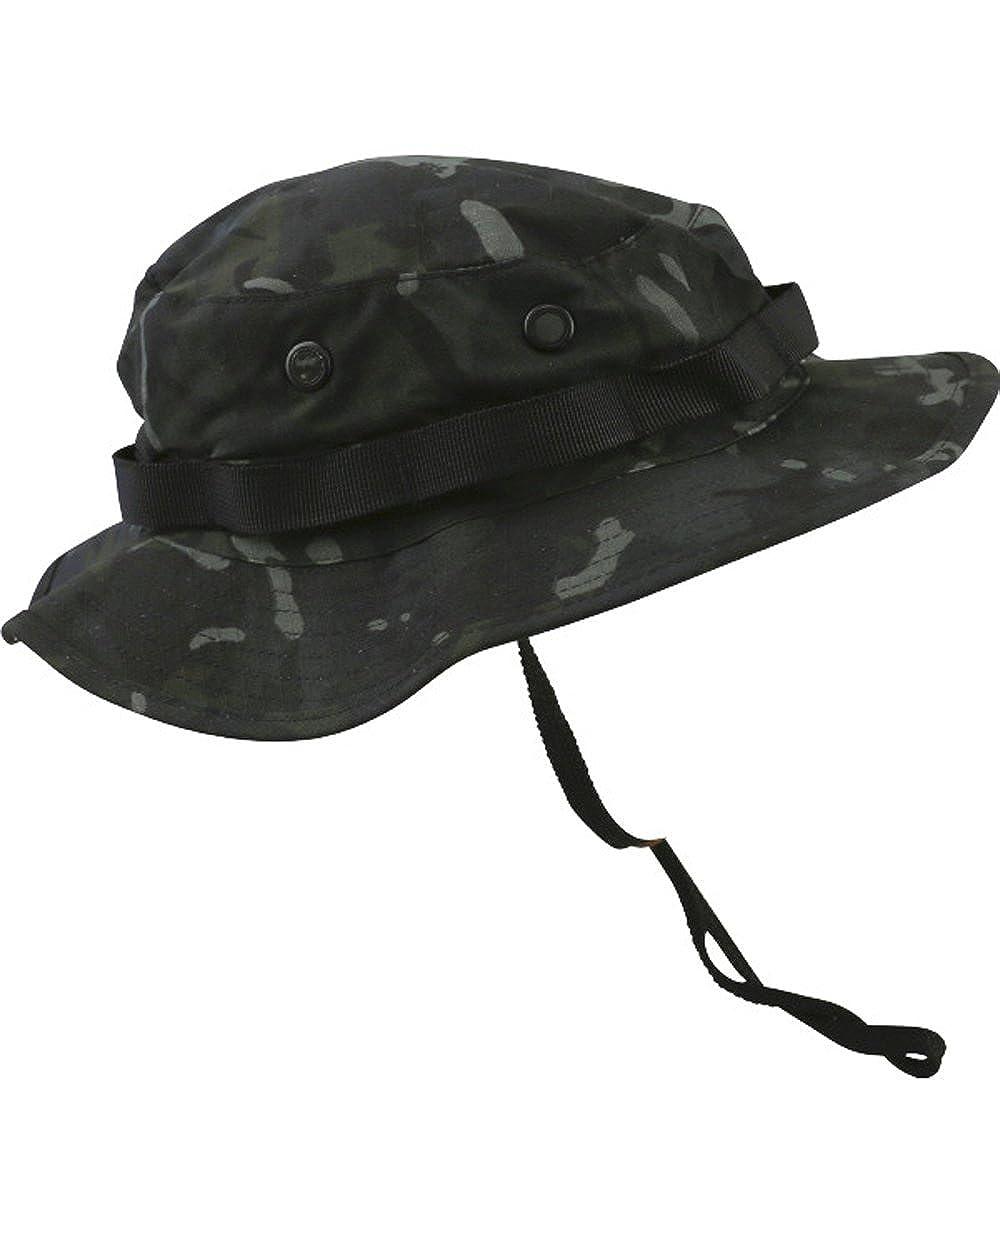 Kombat Tactical Army Combat US Military Army BTP Black Camo Wide Brimmed Jungle Bush Hat Boonie Hat Sun Hat